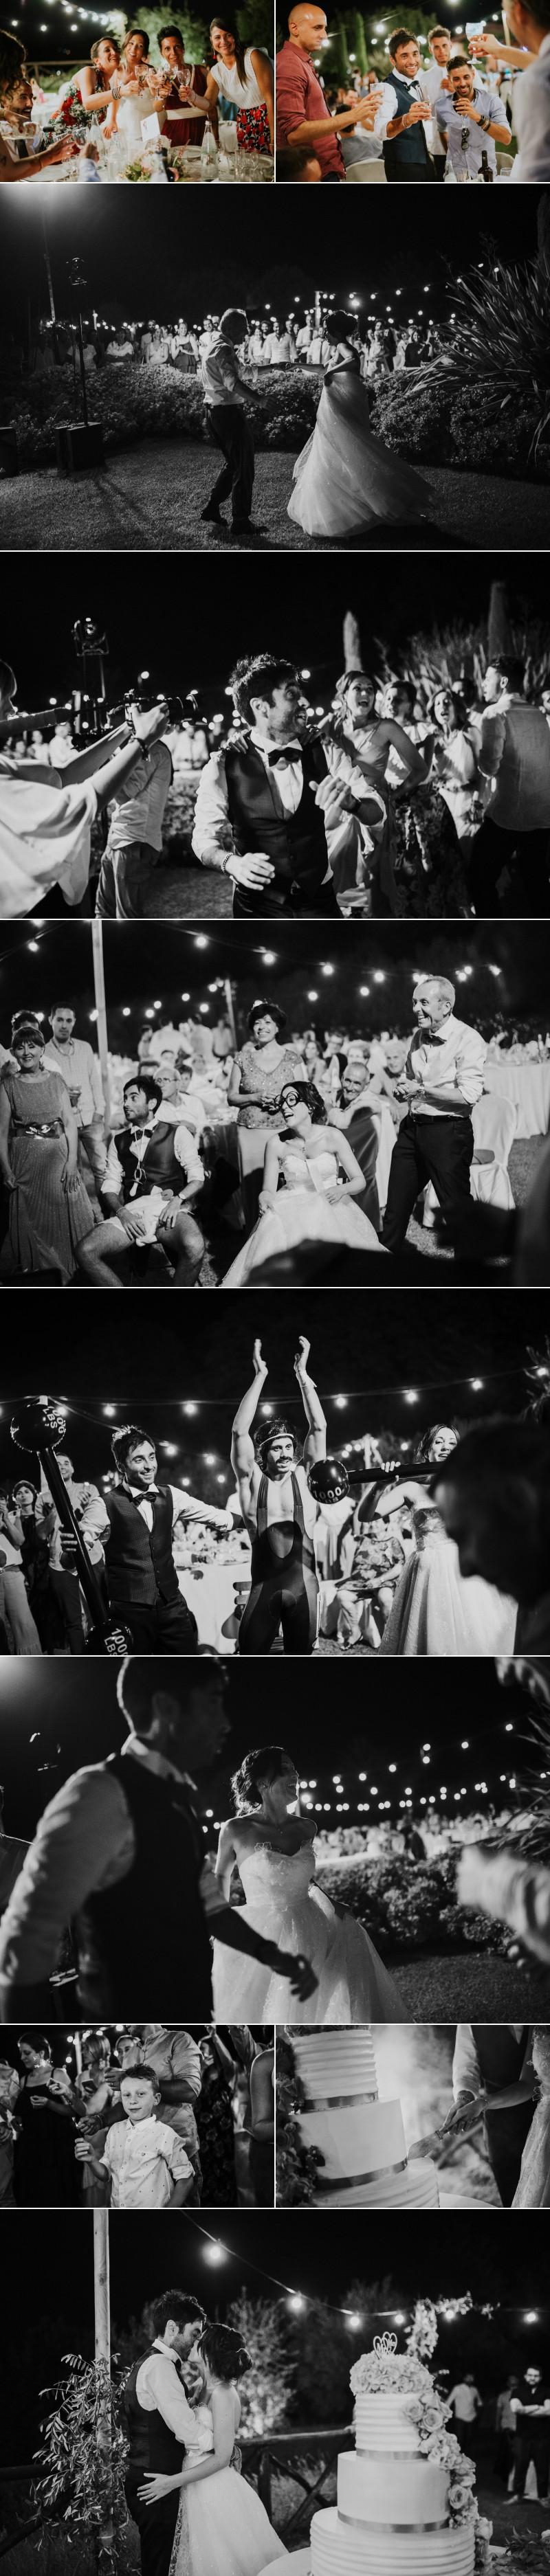 Fotografo Matrimonio Casa Celincordia Cesena 1200